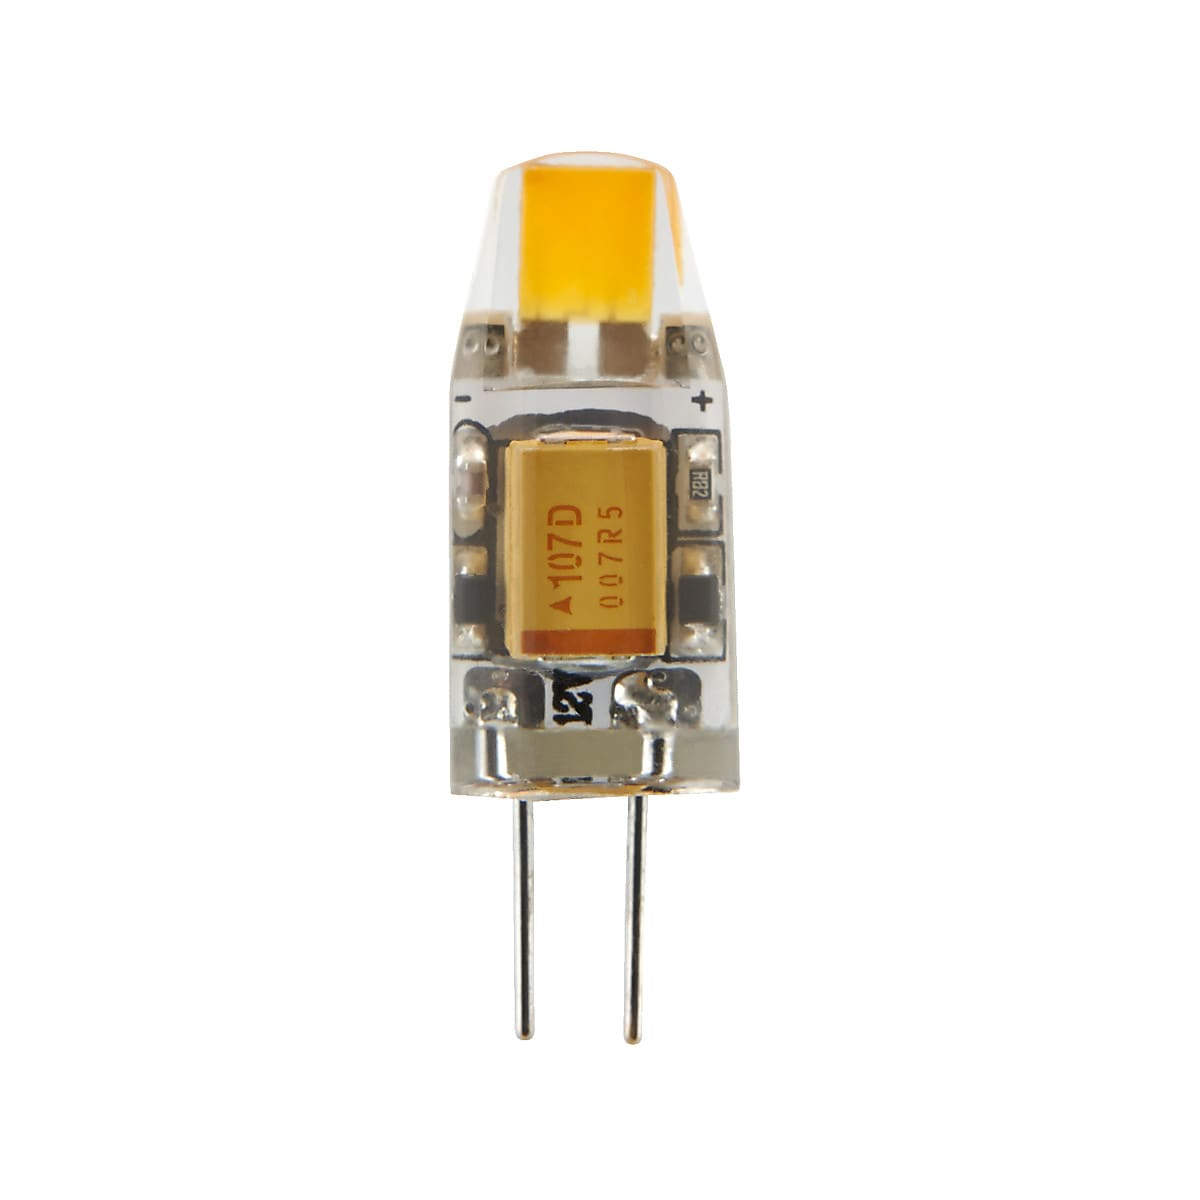 Northlight G4 LED Bulb